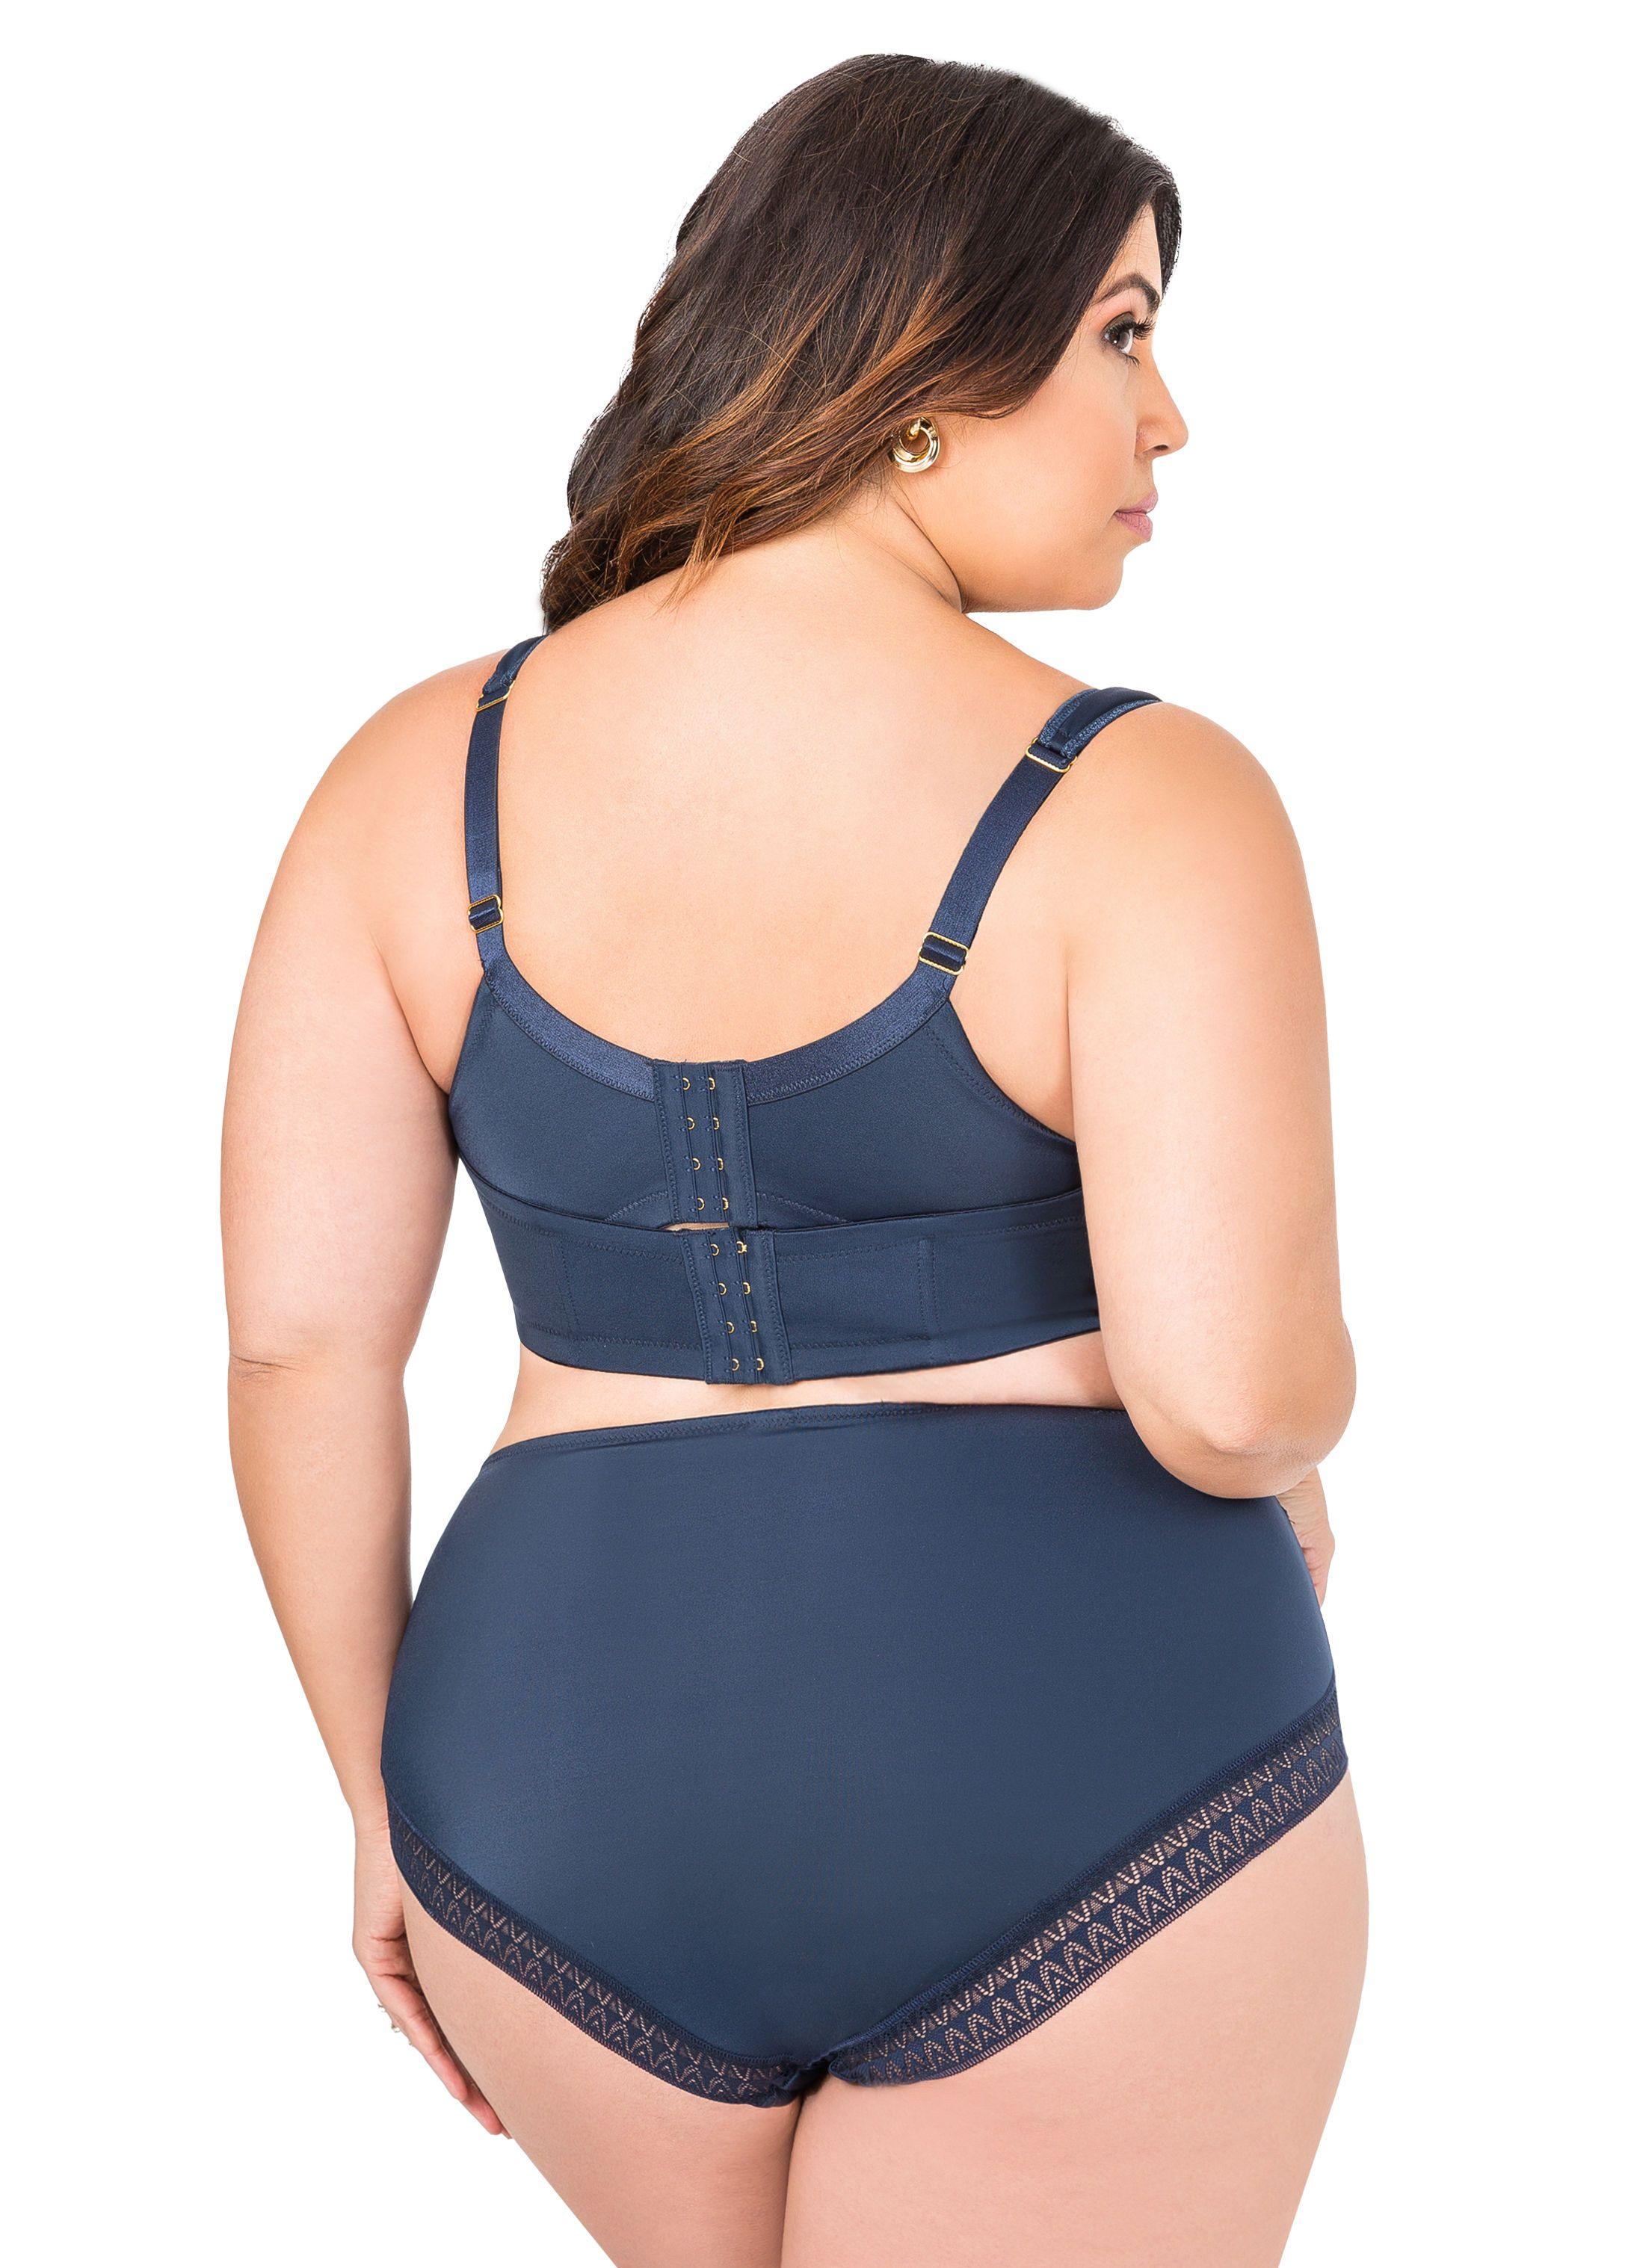 Womens Plus Size Clothing Fashion 49